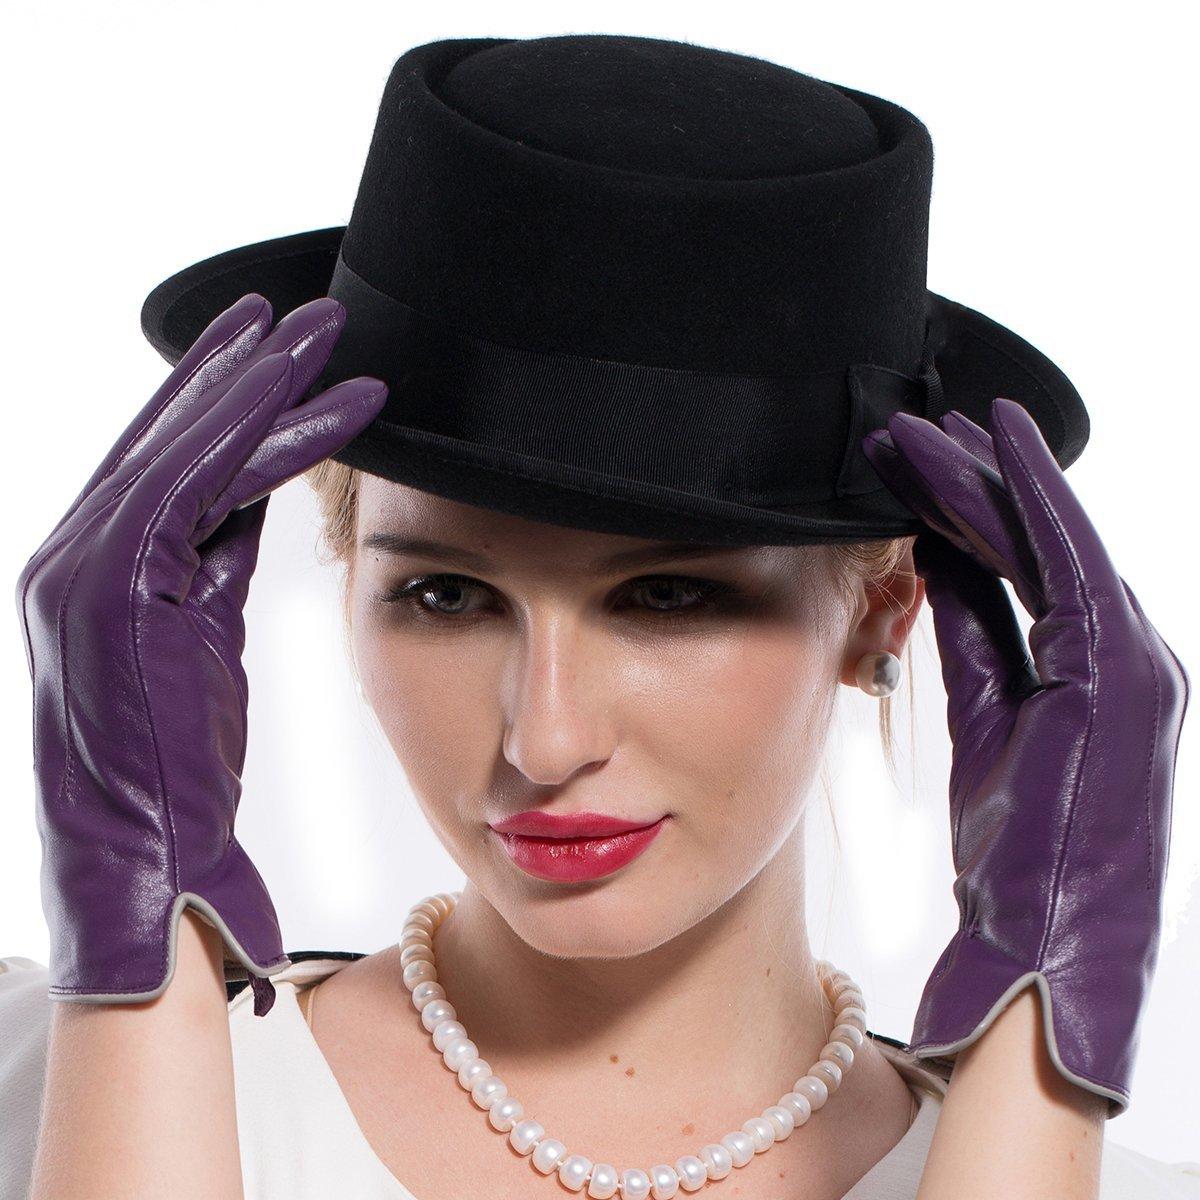 MATSU Women Winter Warm Leather 100% Cashmere lined Gloves TouchScreen 5 Colors M9906 (XL, Purple-TouchScreen)